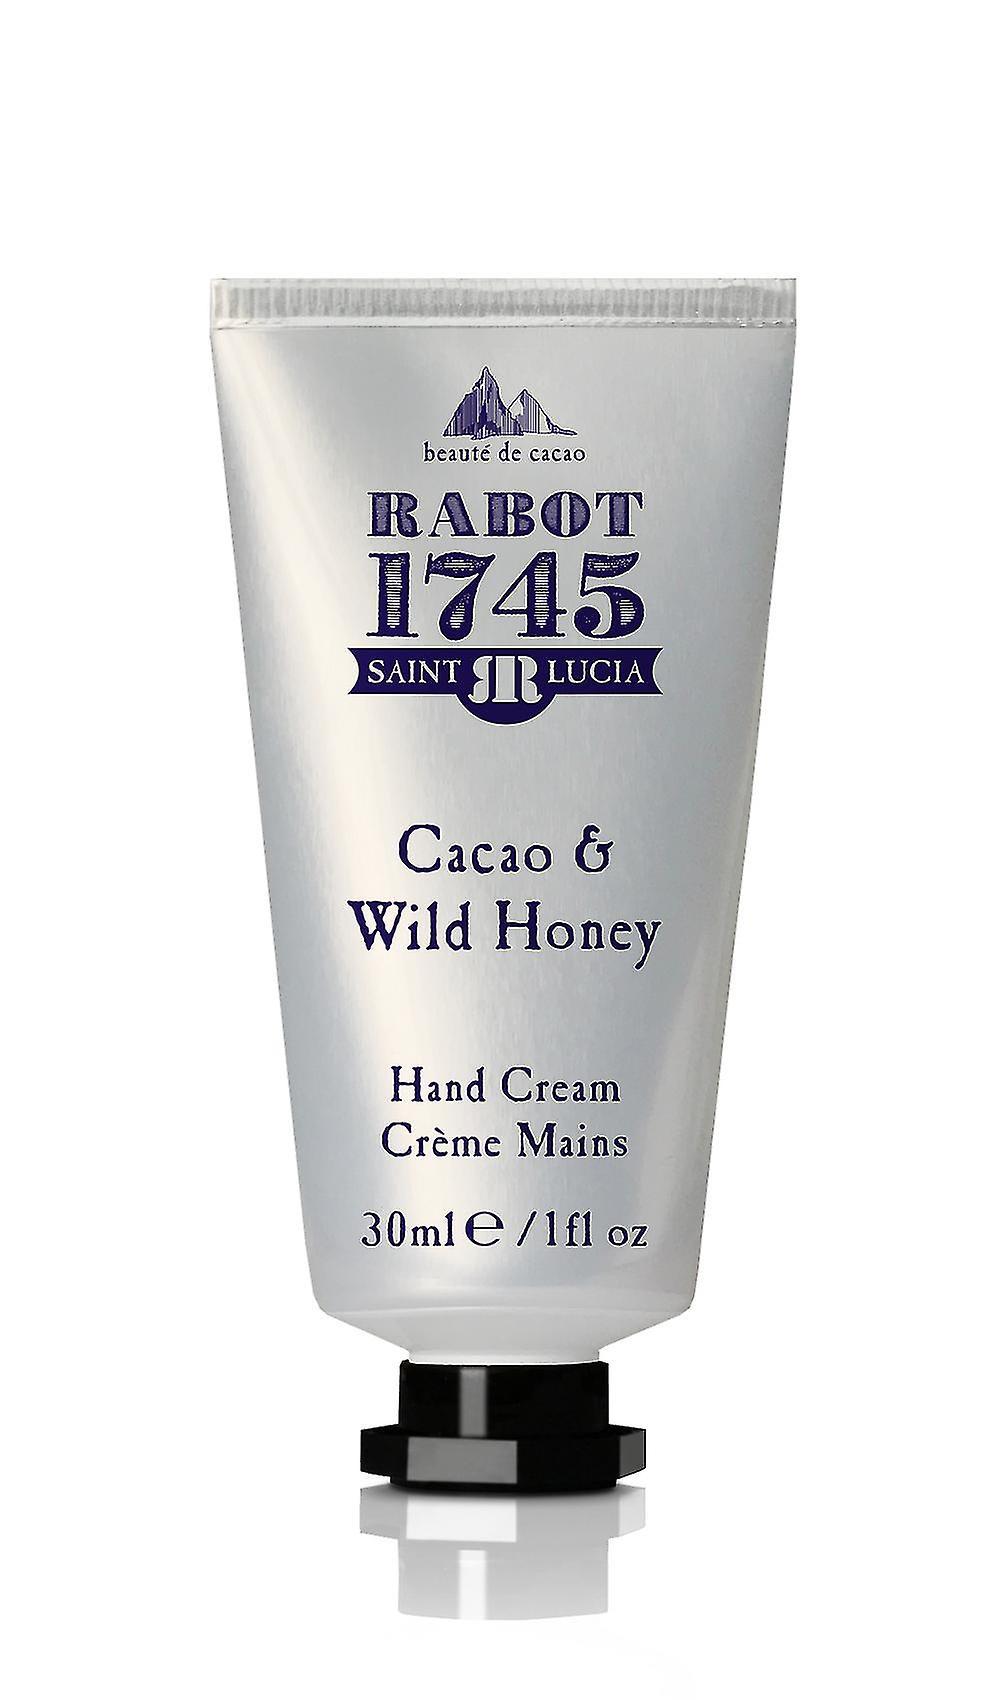 Cacao & wild honey hand cream 30ml